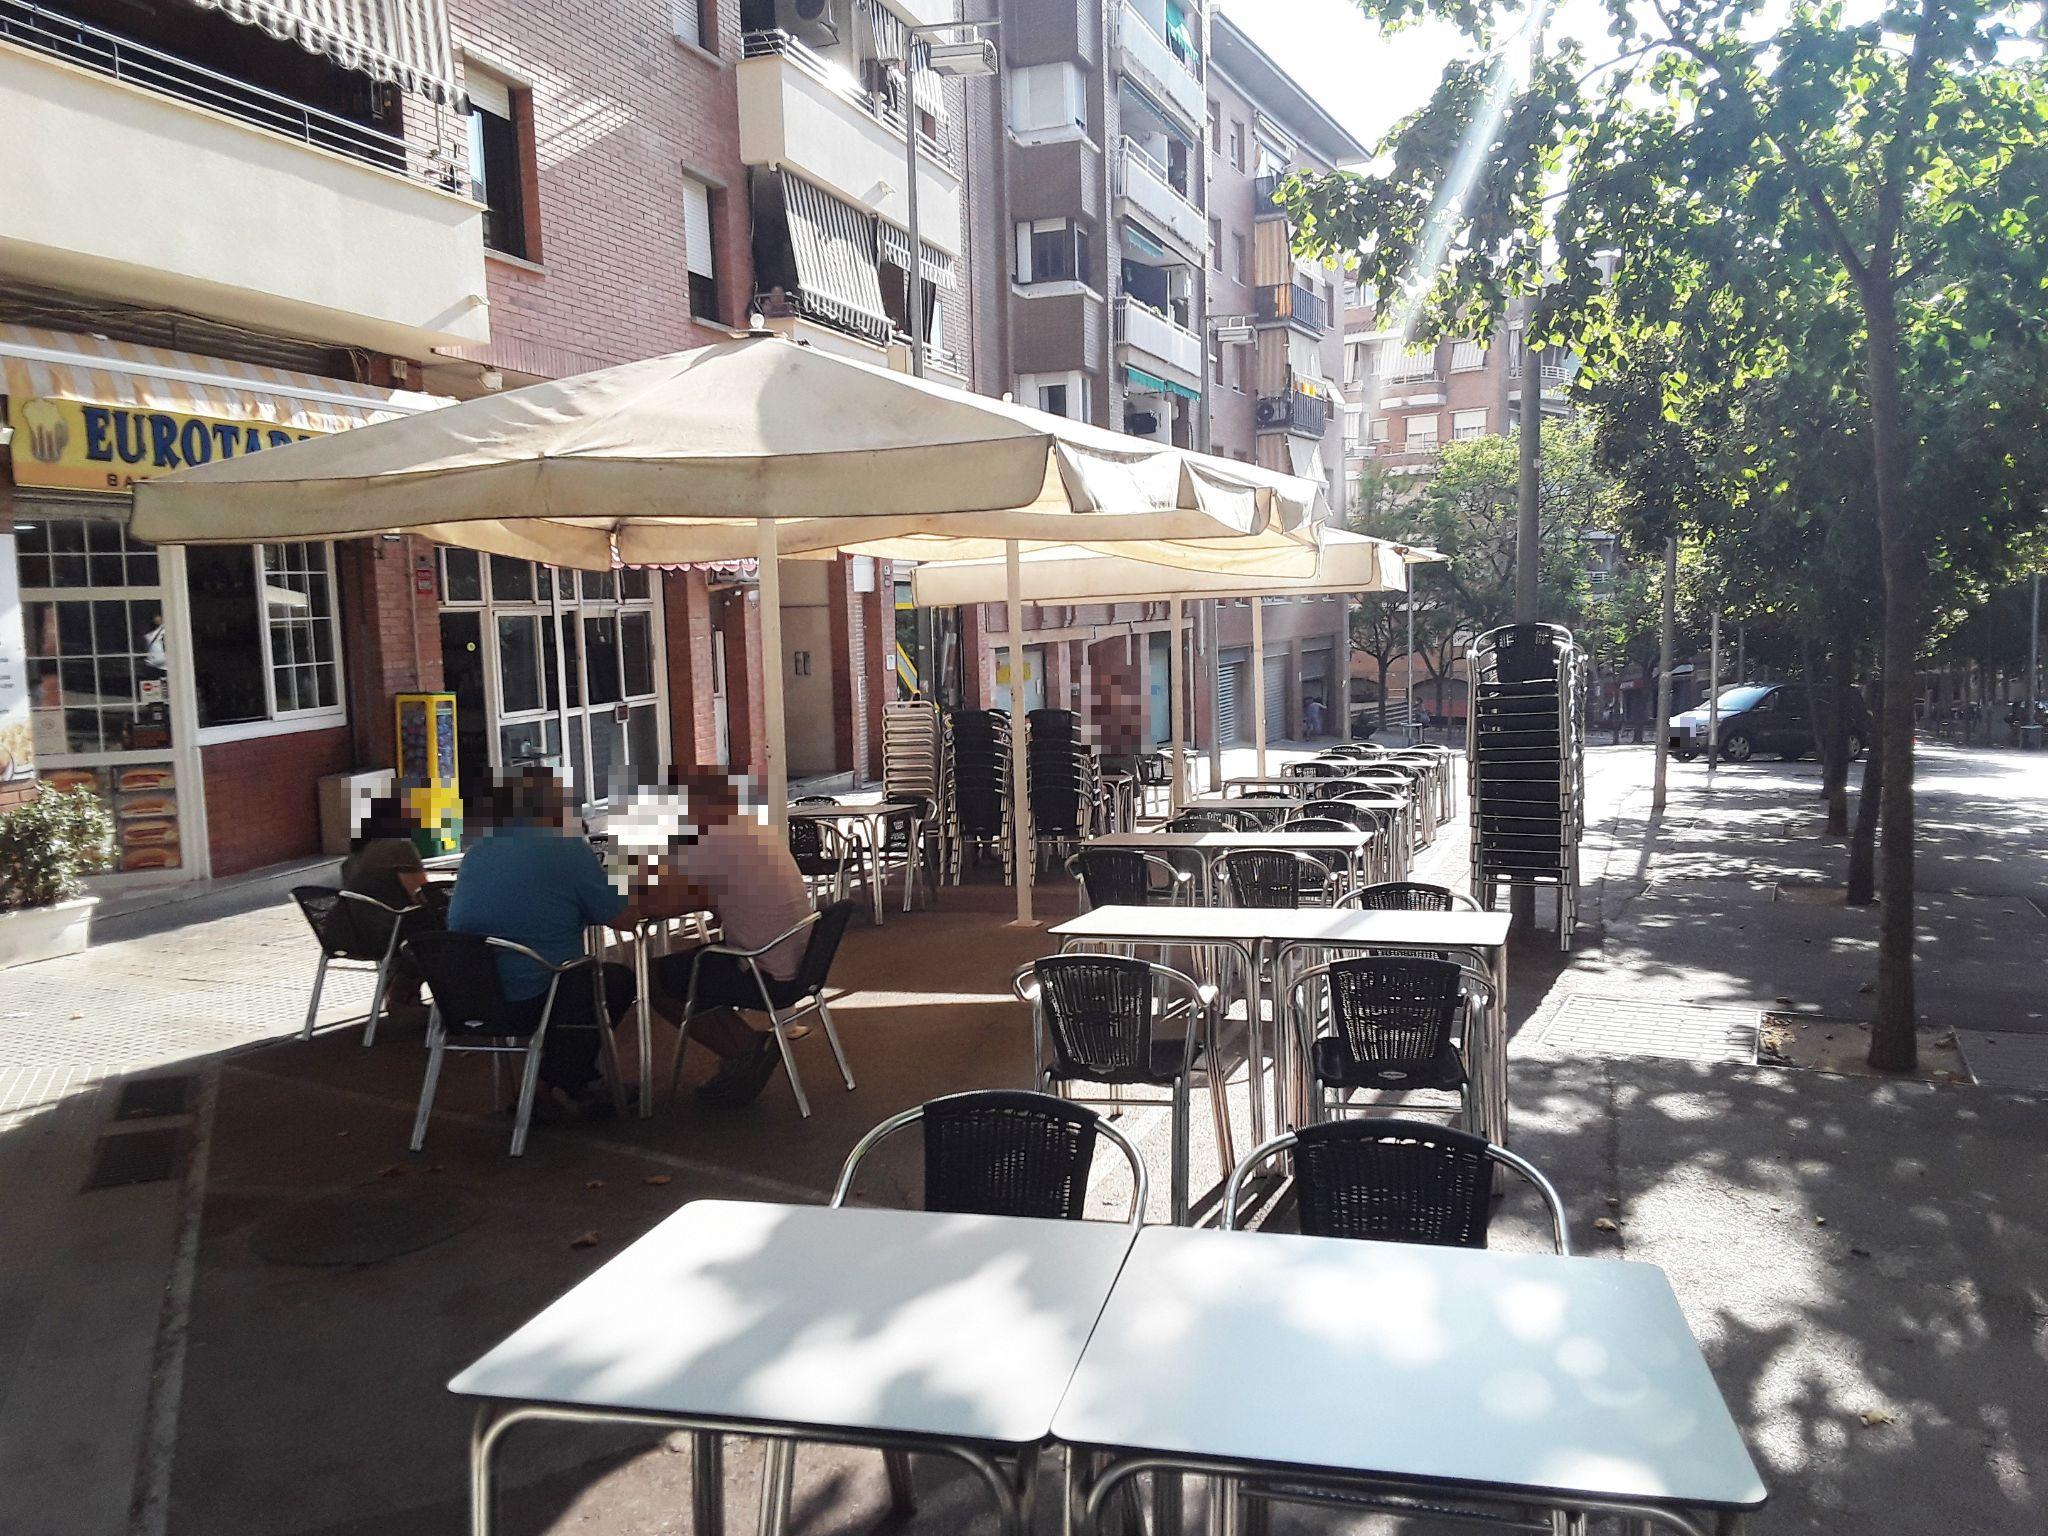 bar-bien-situado-en-alquiler-en-viladecans-barcelona-3